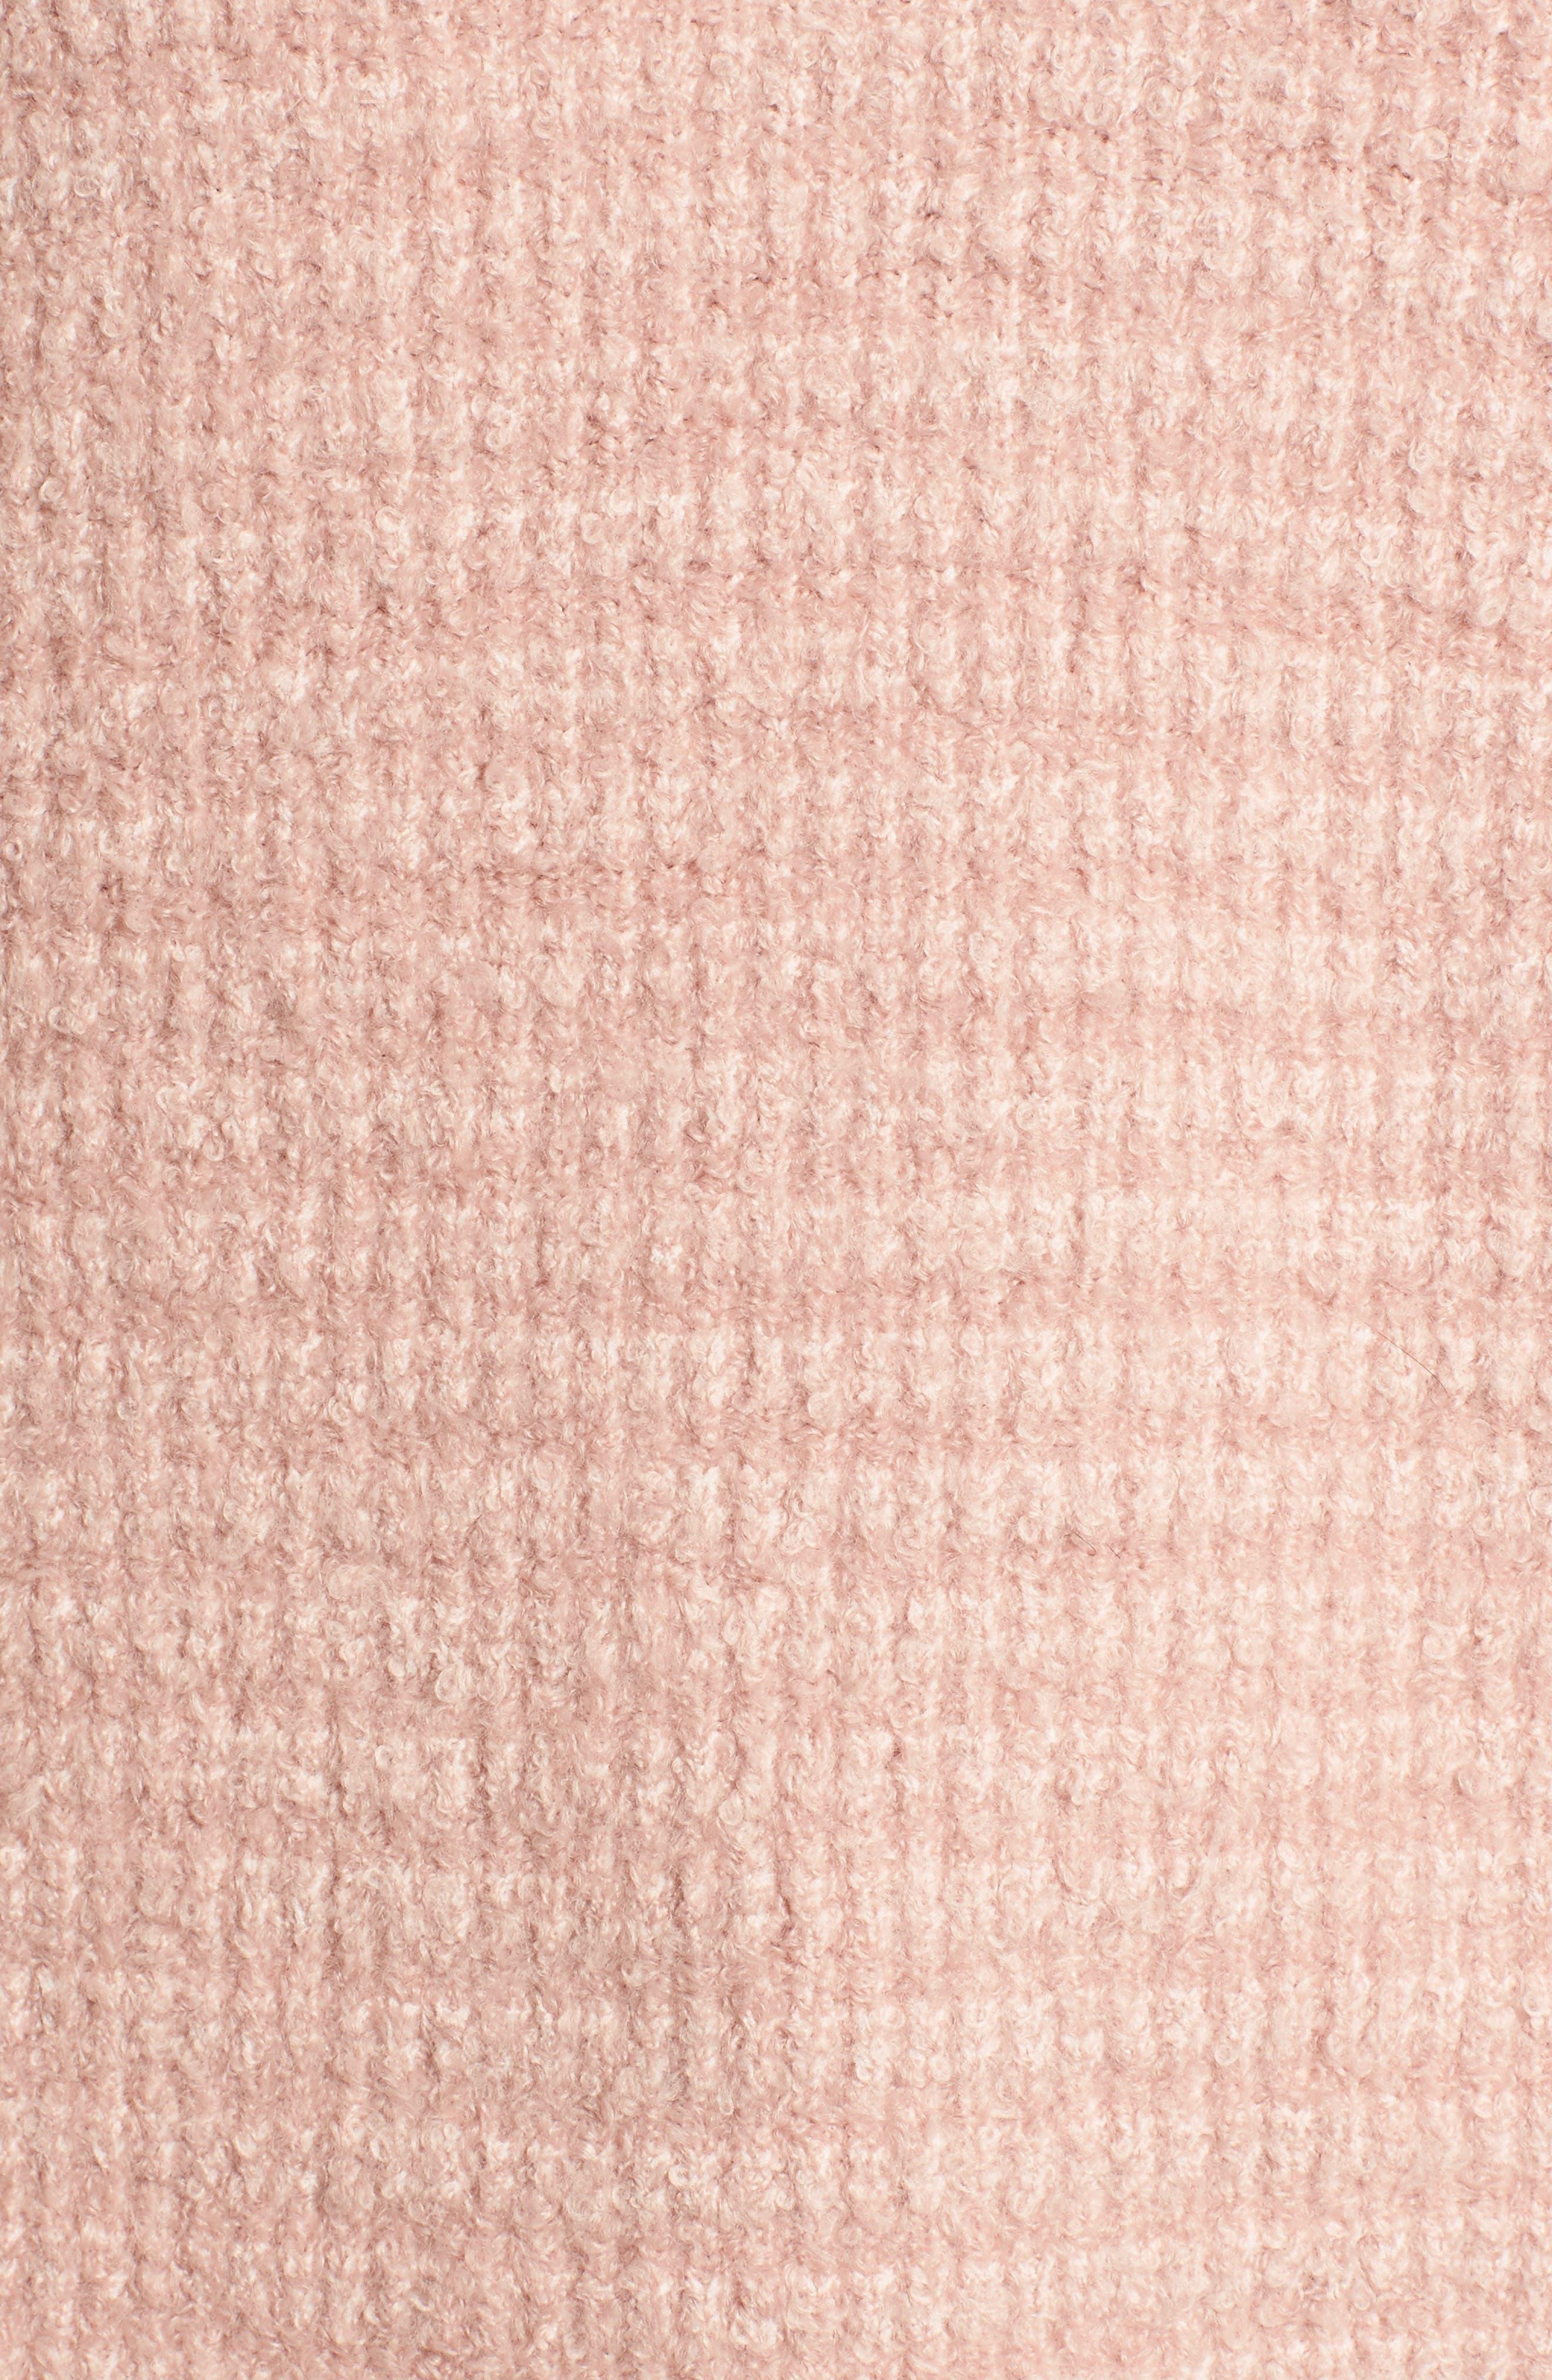 Lace Inset V-Neck Sweater,                             Alternate thumbnail 17, color,